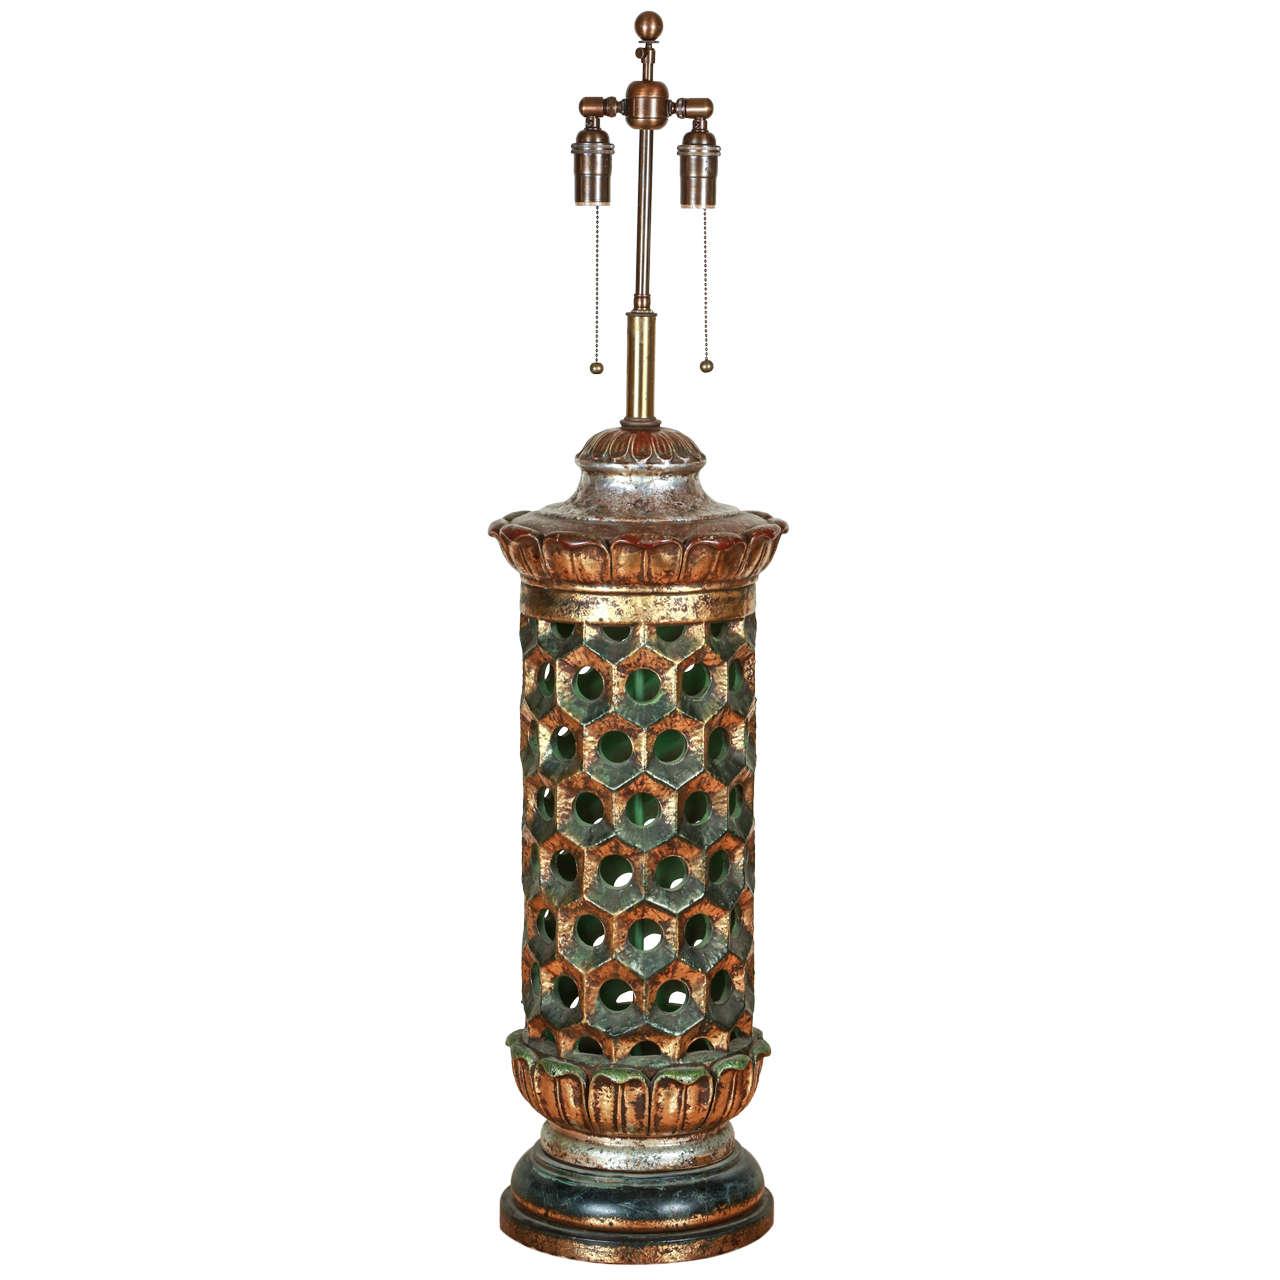 Grand Ceramic Table Lamp by Nrdini